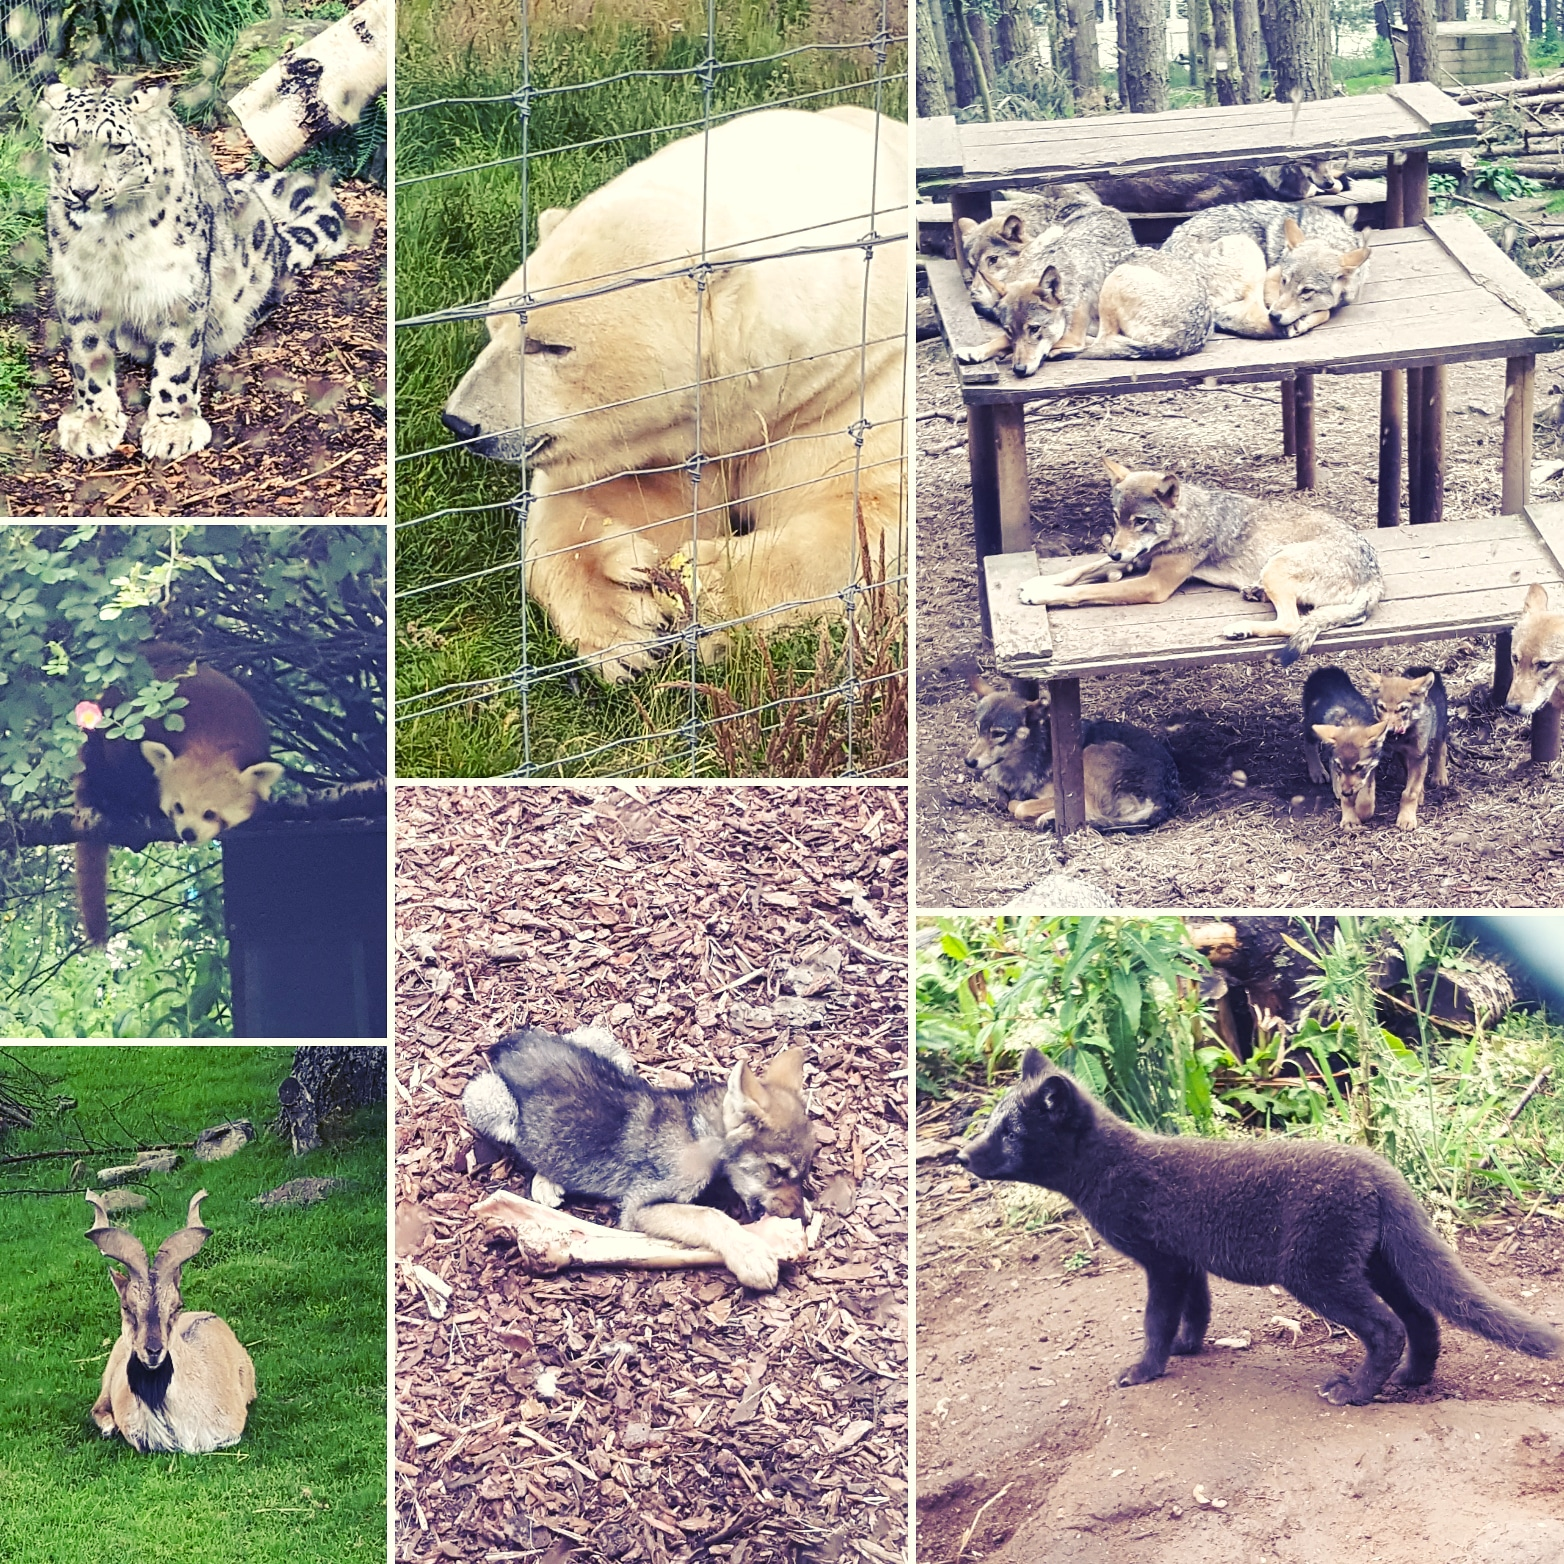 Highlands Wildlife Park - snow leopard, polar bear, red panda, wolves, deer, arctic fox cub - The Last Krystallos